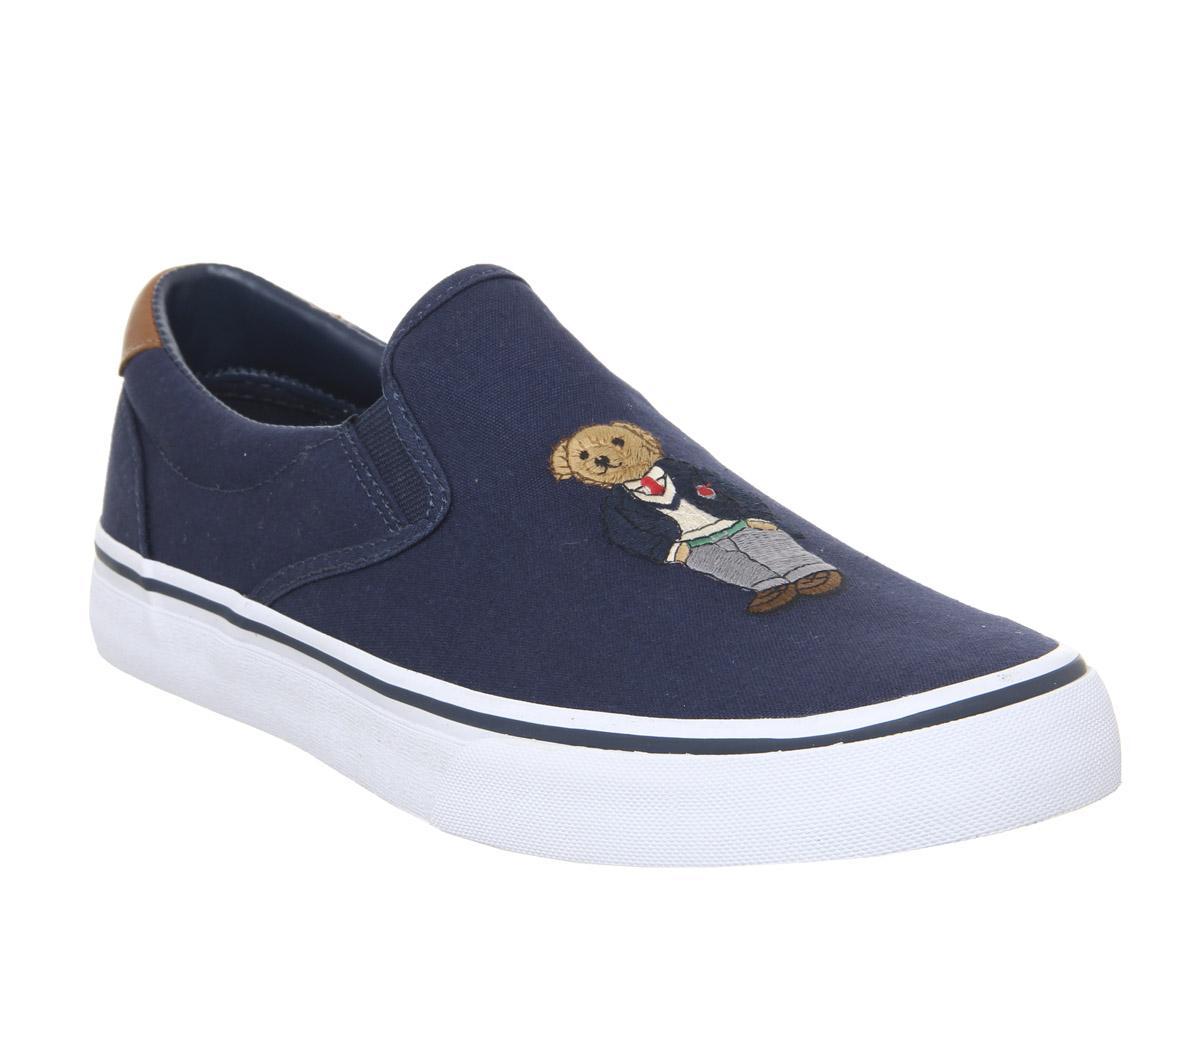 Thompson Slip On Sneakers